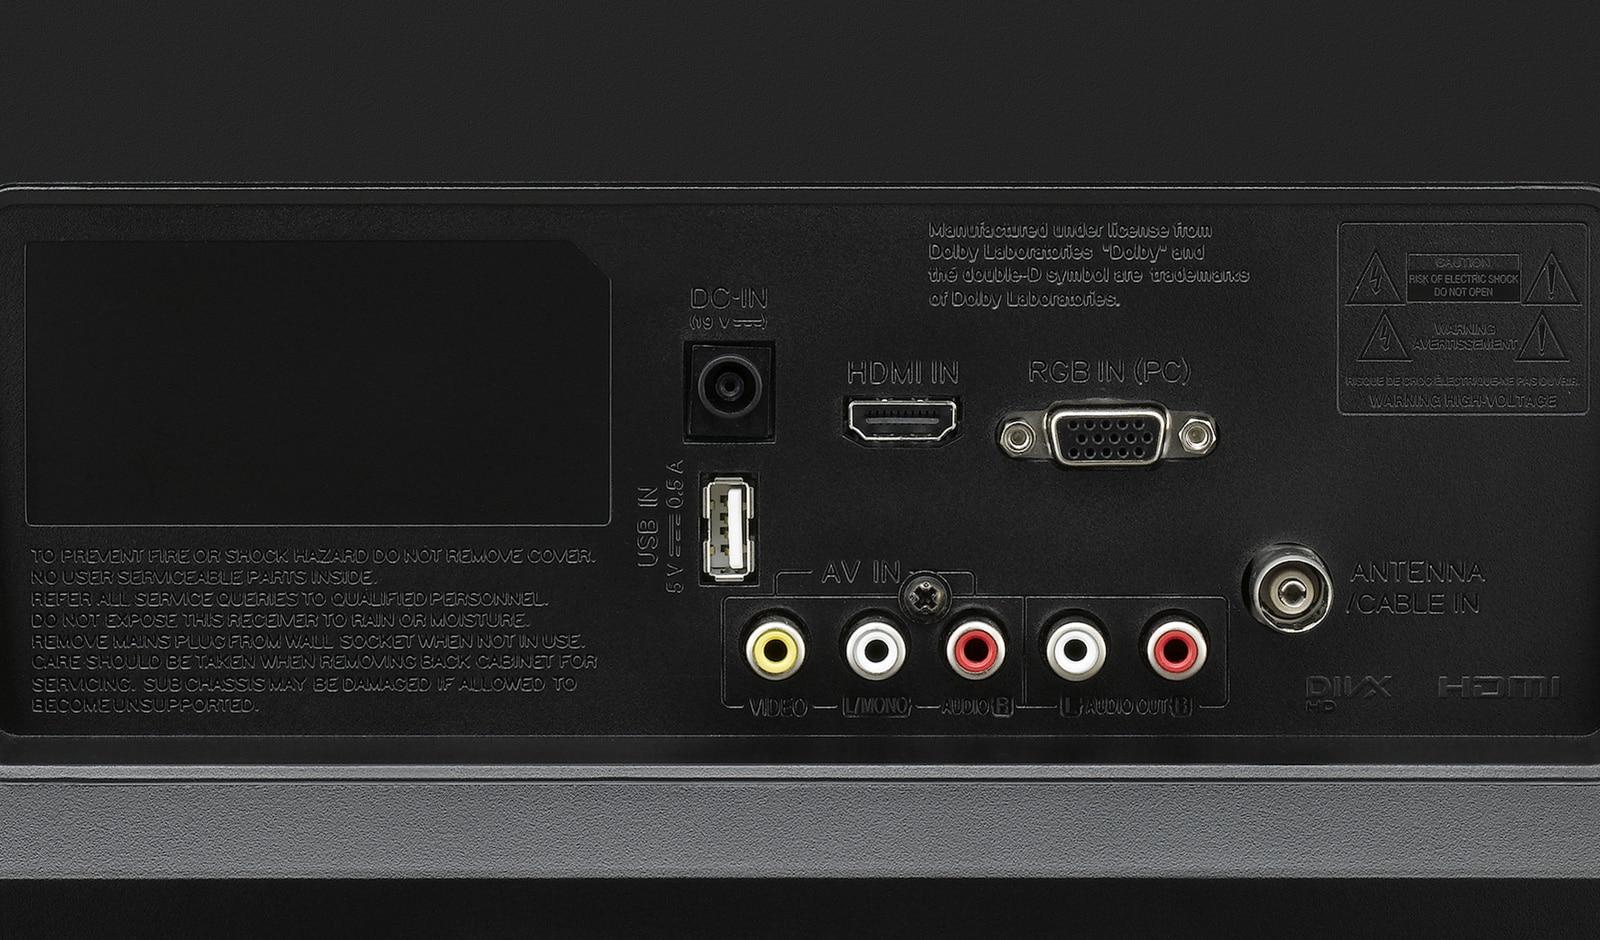 Lg 24 Class Hd Tv Monitor 235 Diagonal Uae Light Stand Profesional Lcs 01